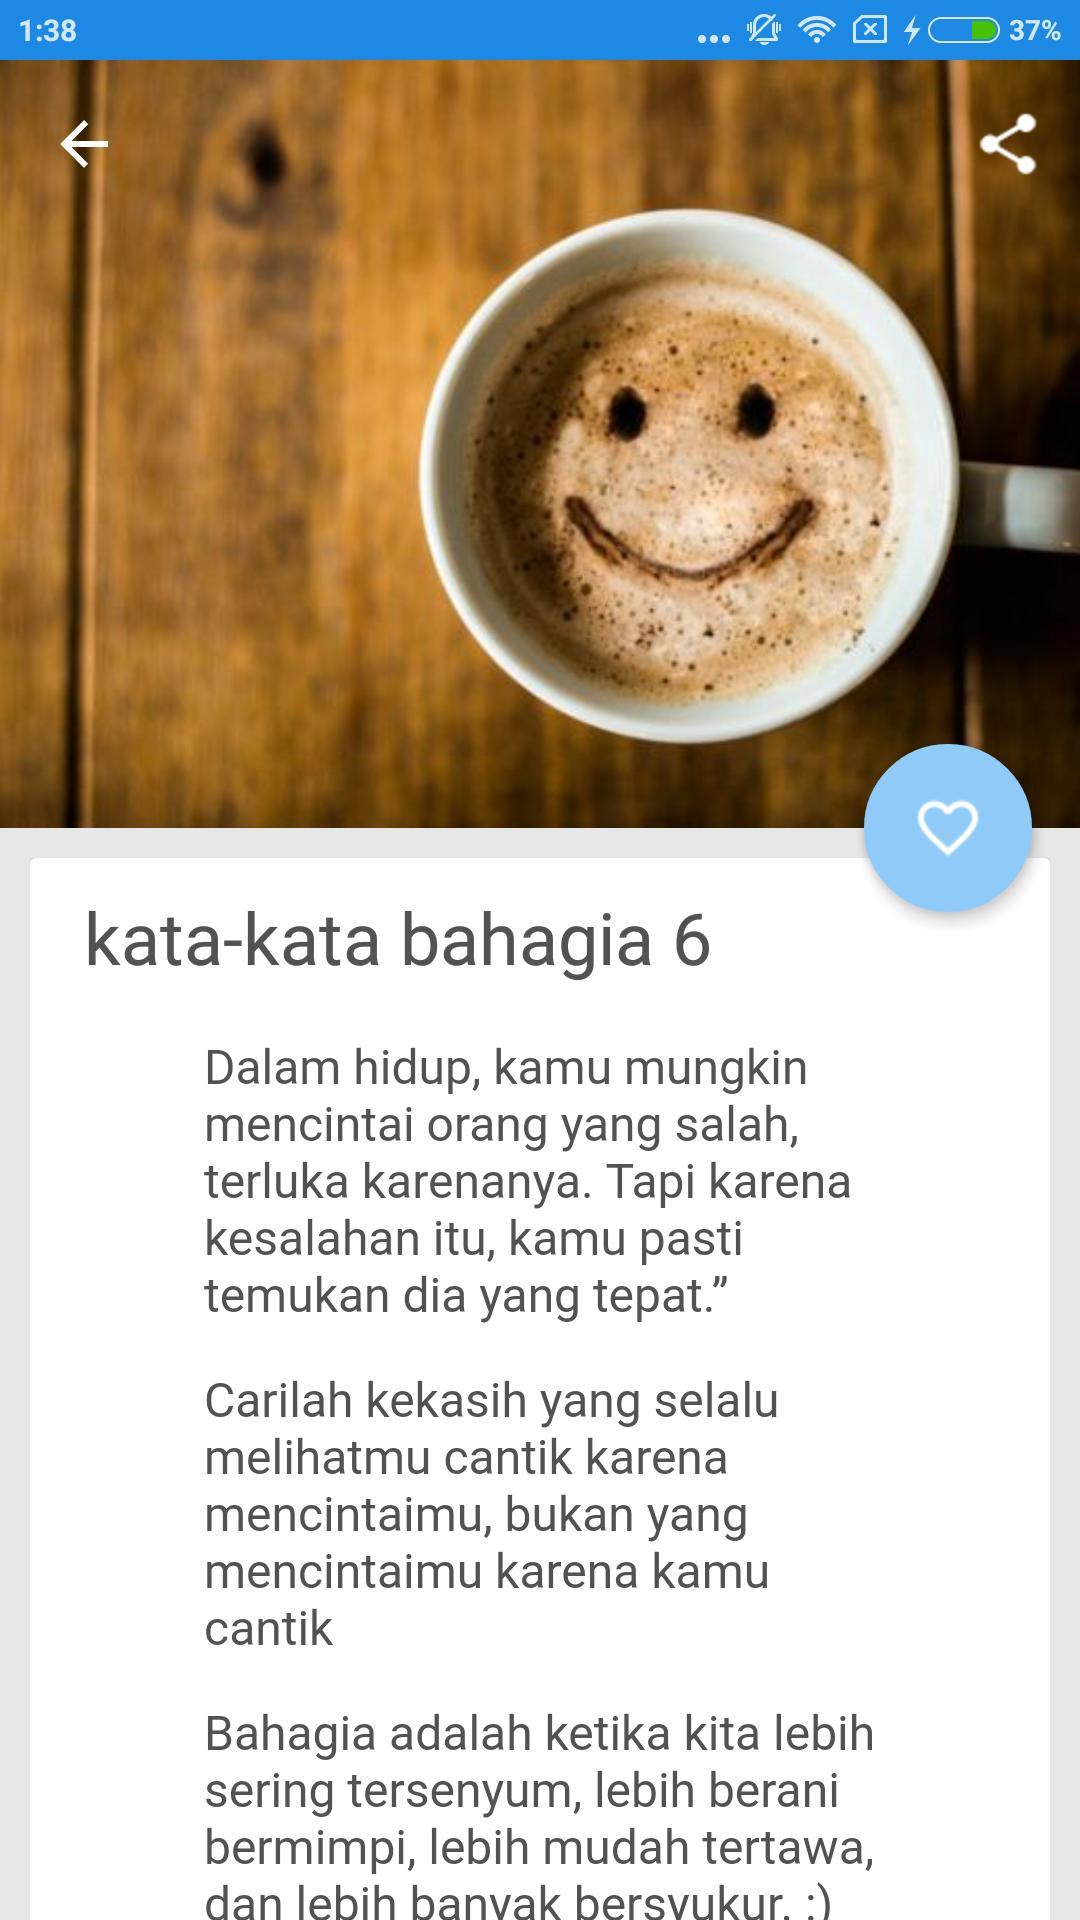 Kata Kata Bahagia Fur Android Apk Herunterladen